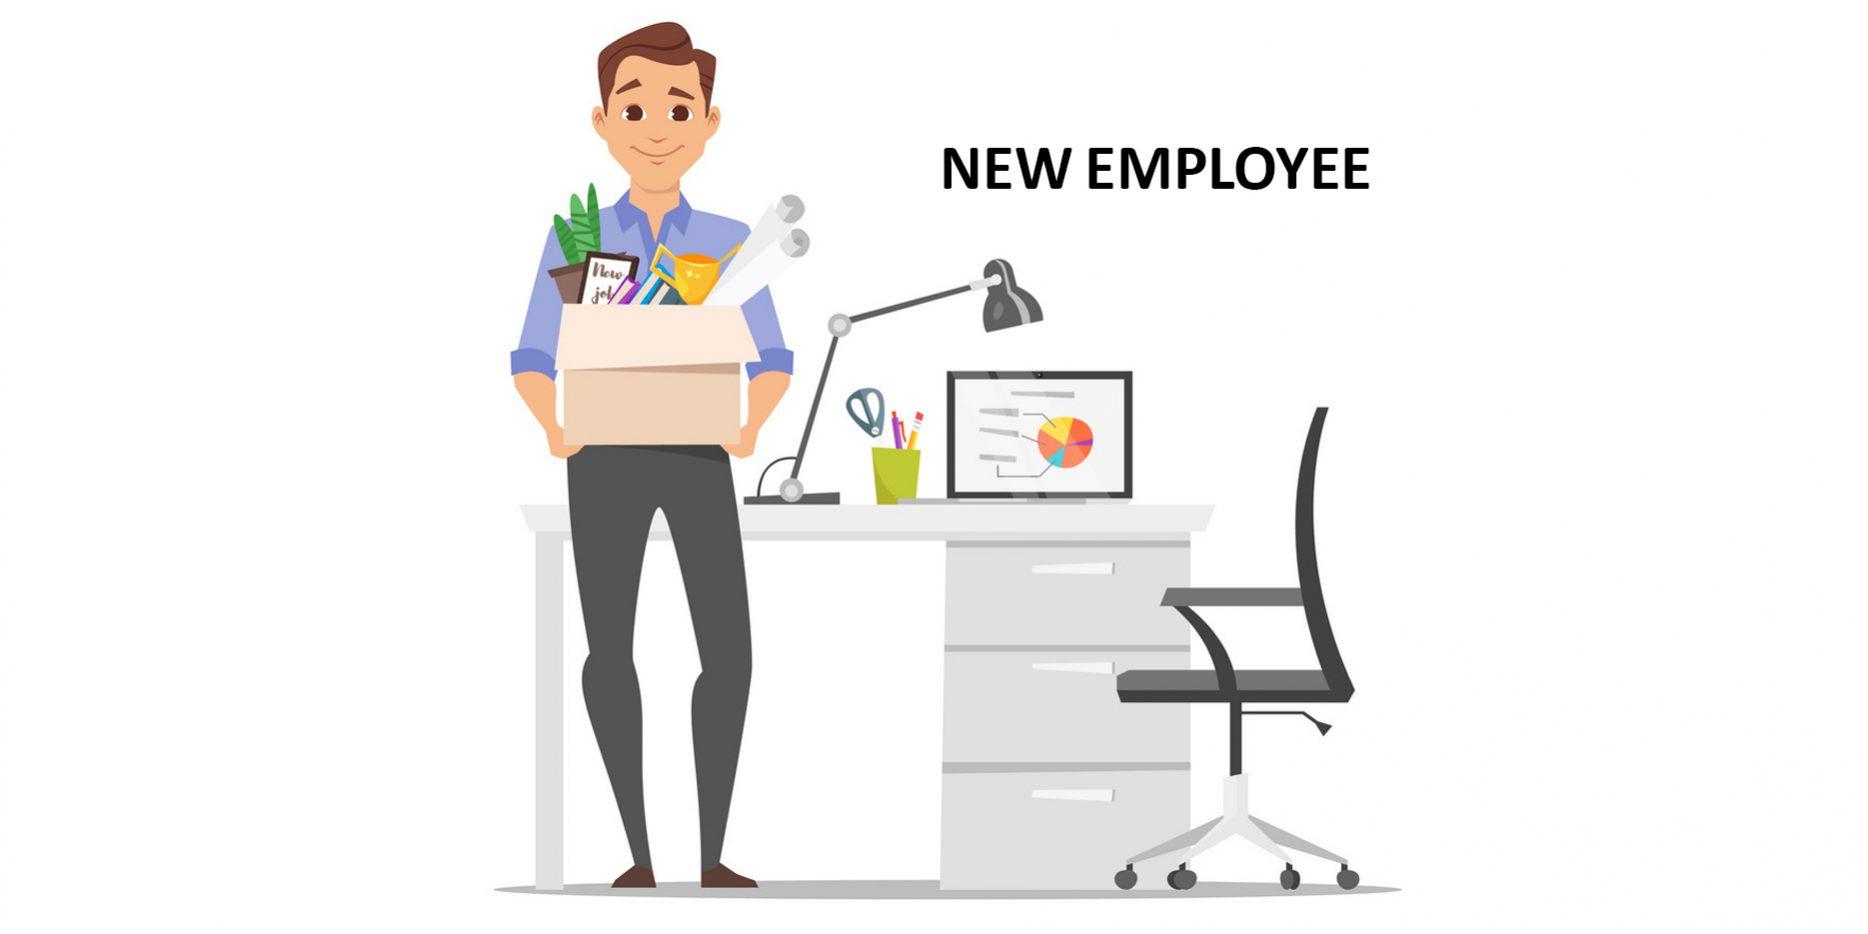 کارمند کیست؟